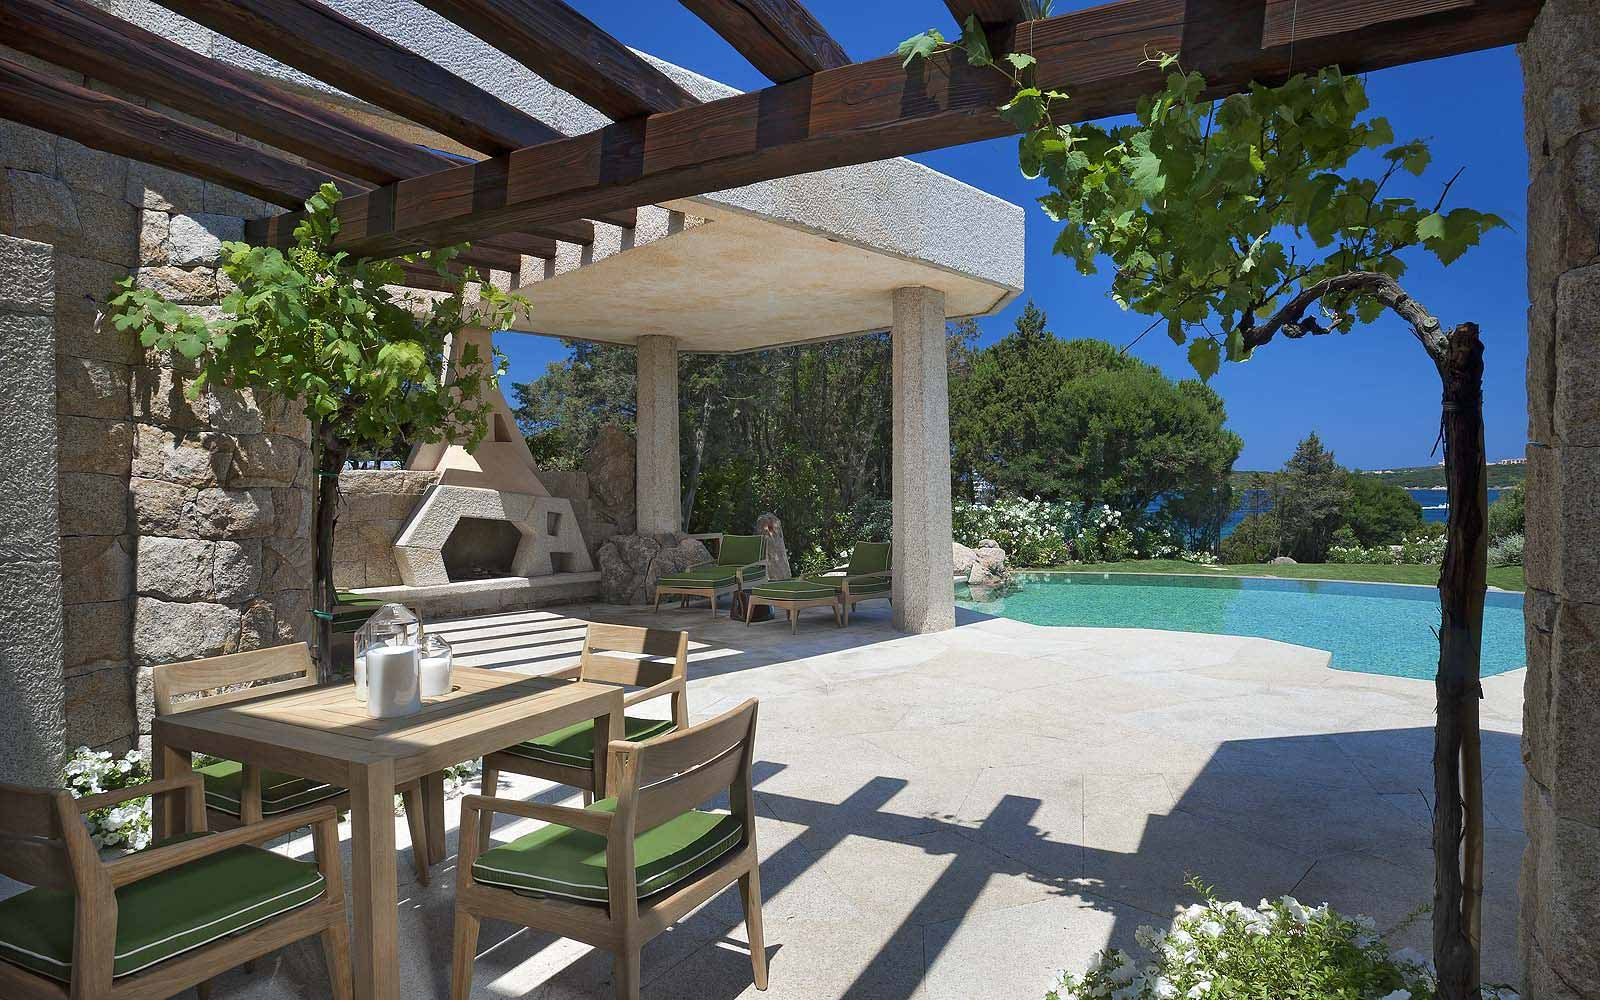 Three Bedroom Villa Bithia with private pool at the Hotel Pitrizza